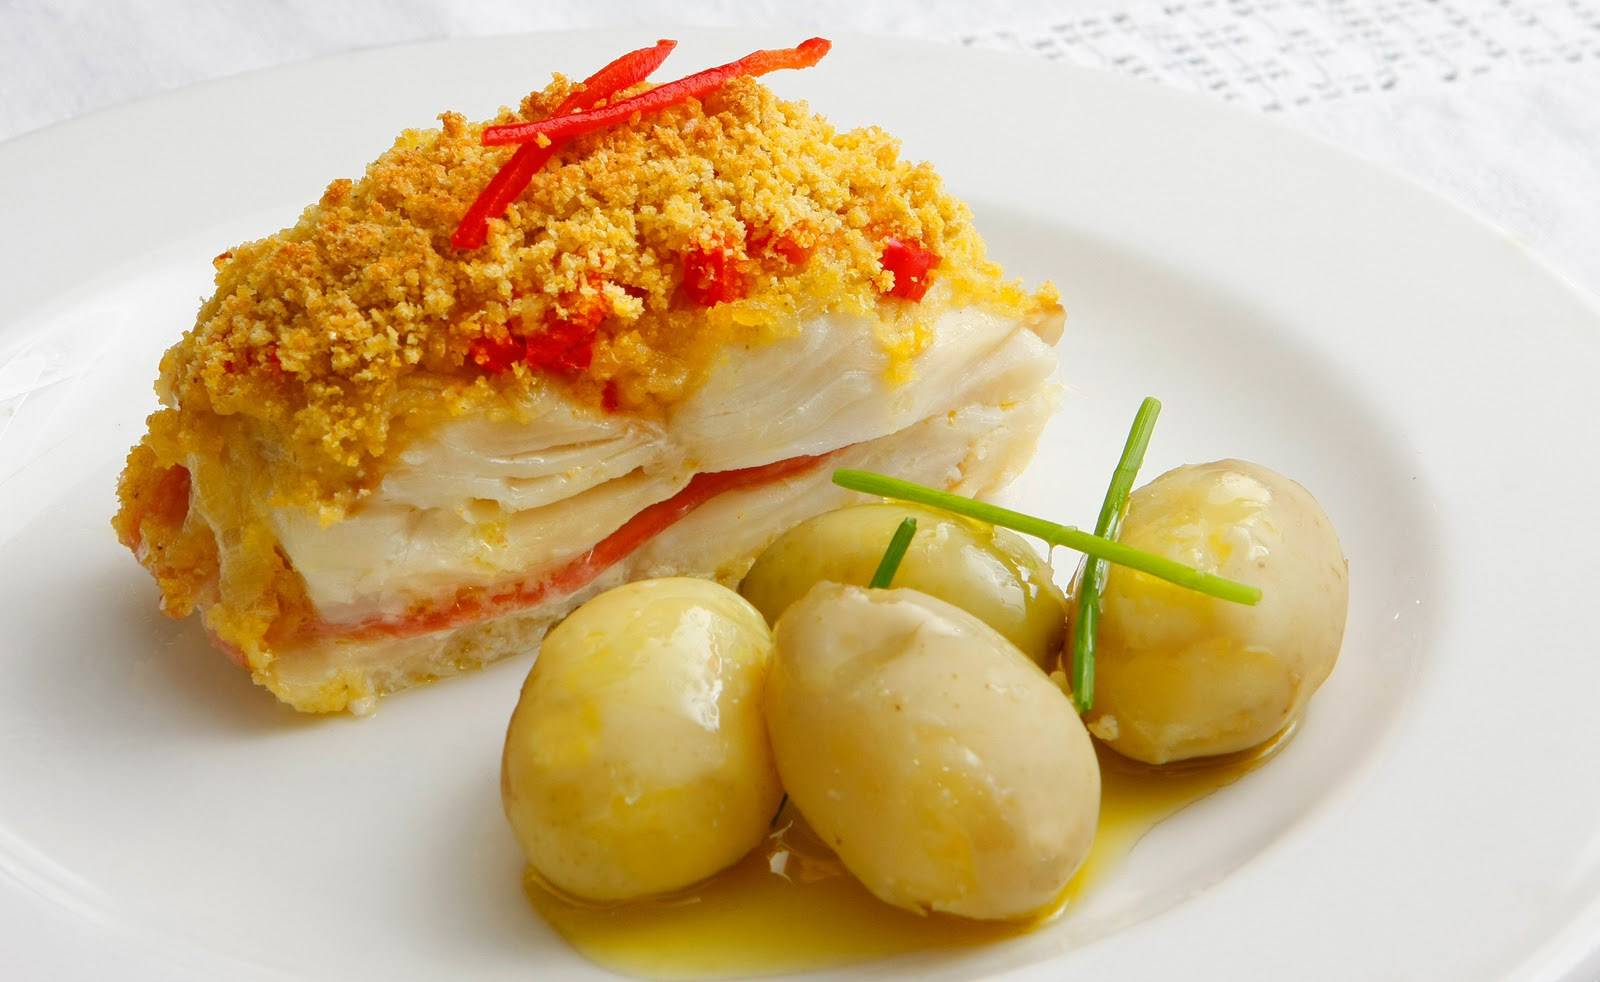 O bacalhau na dieta 1